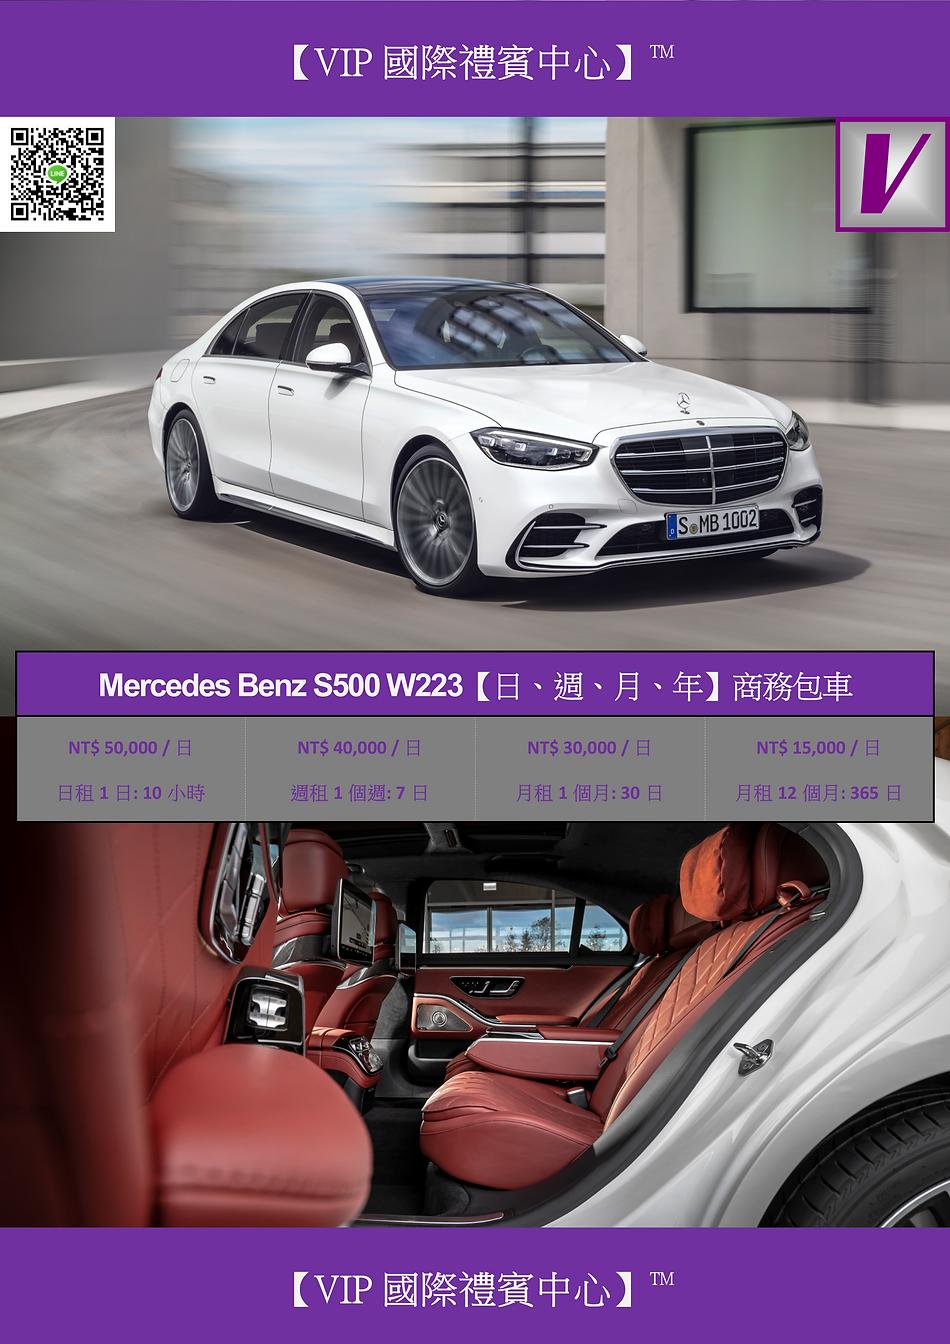 VIP國際禮賓中心 MERCEDES BENZ S500 W223 DM.png